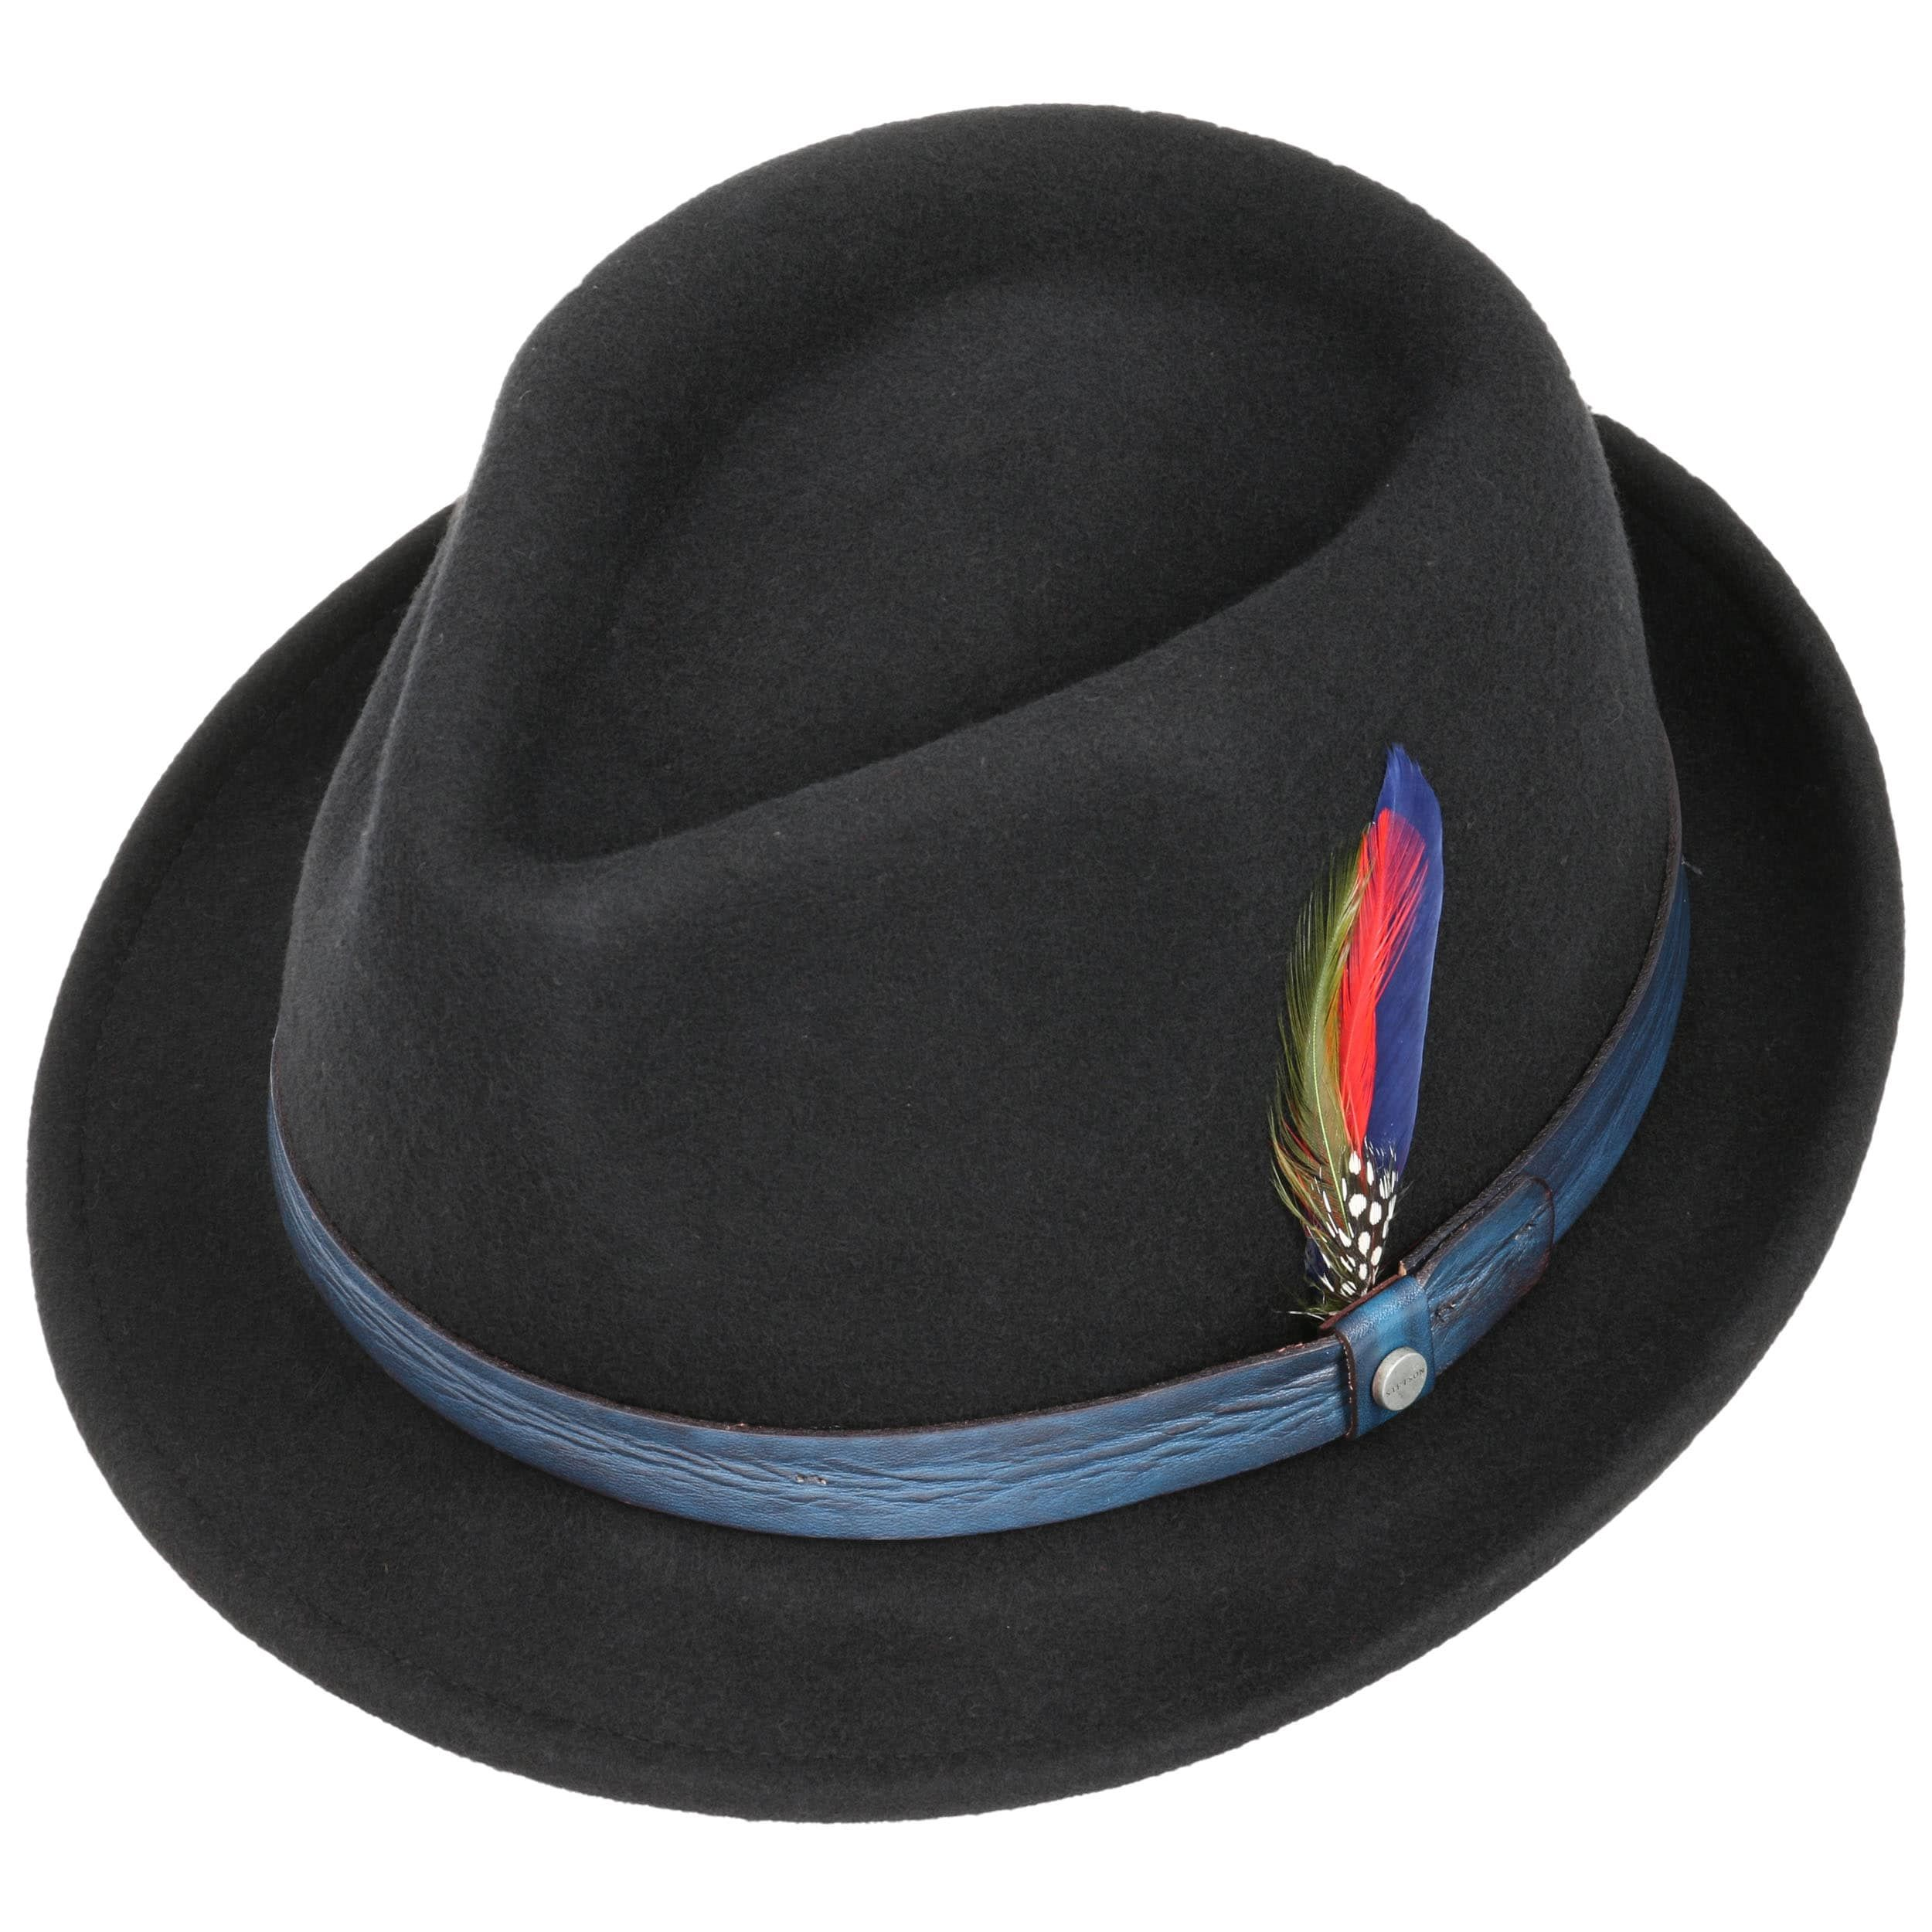 Craston Trilby Wool Felt Hat black